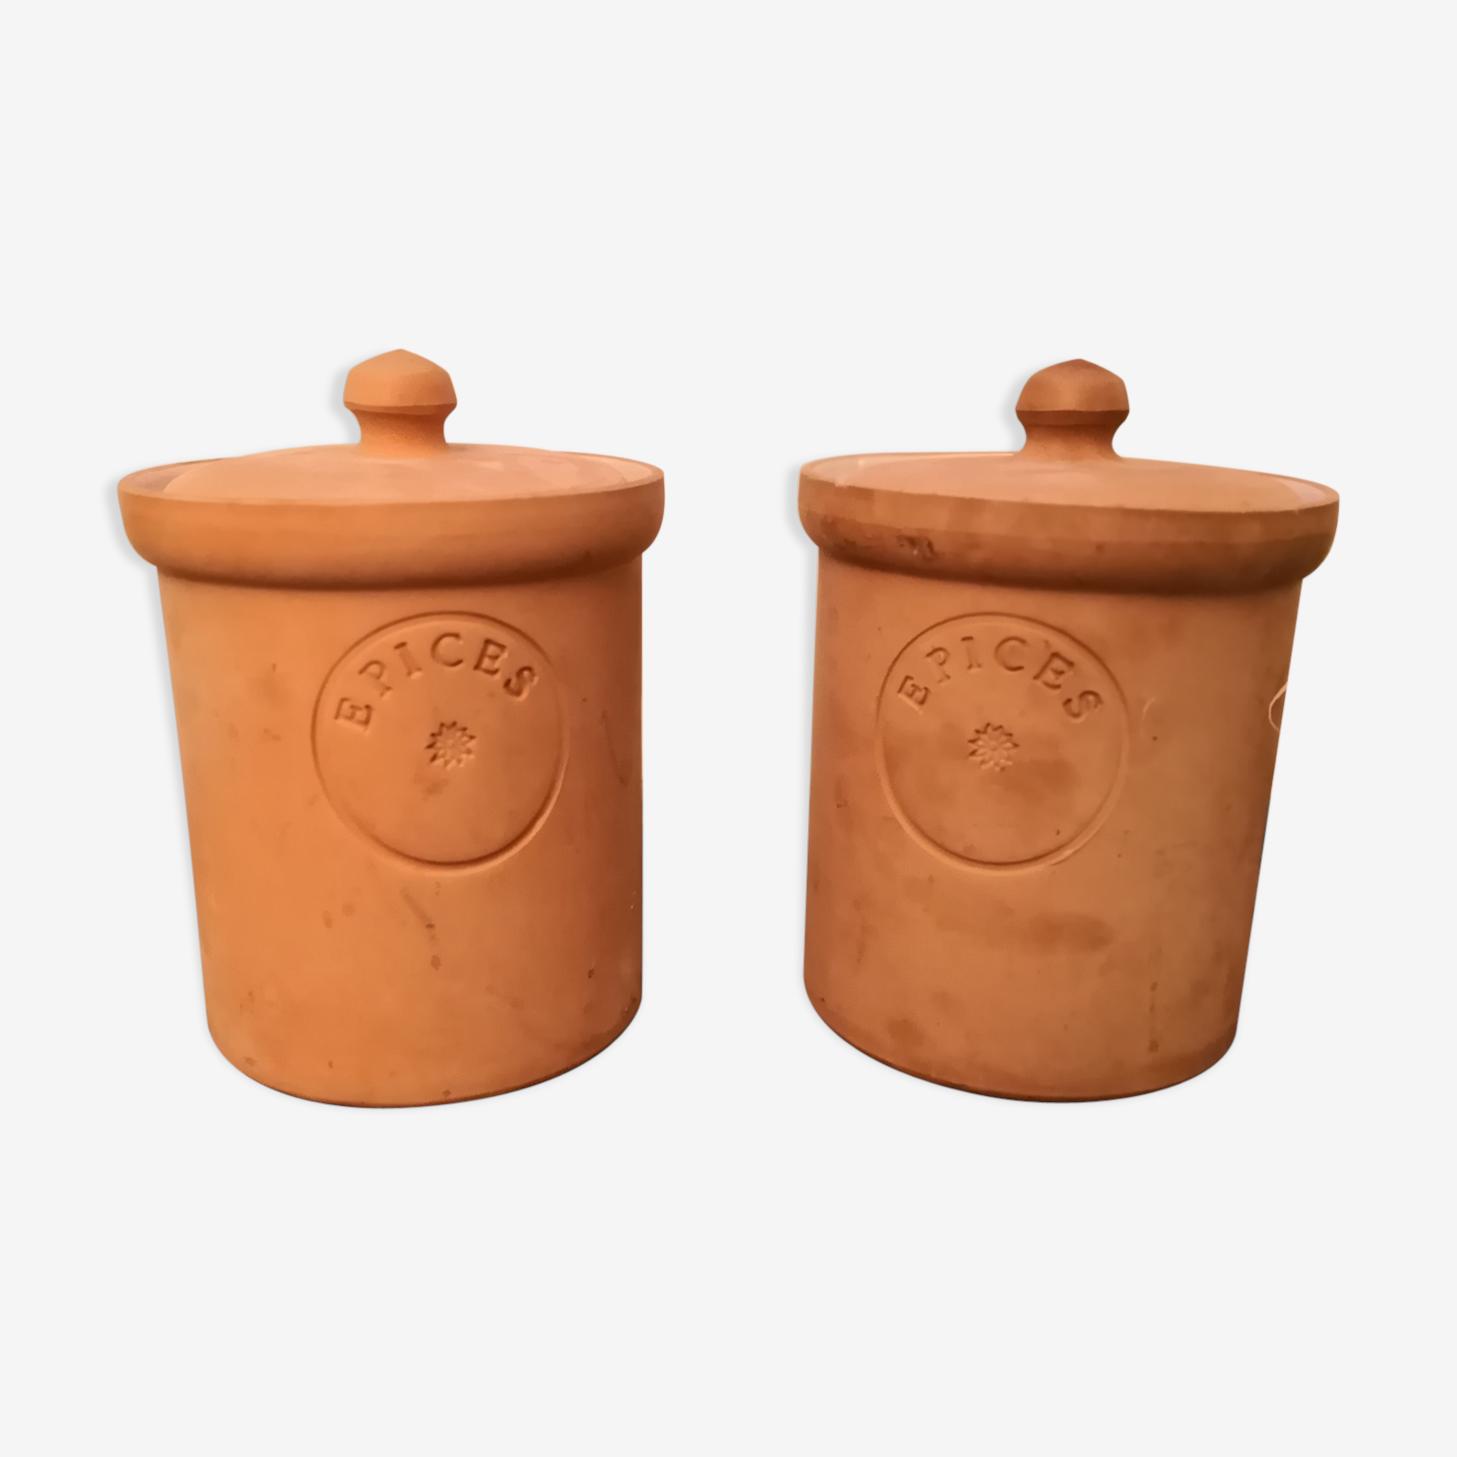 Spice pots, terracotta